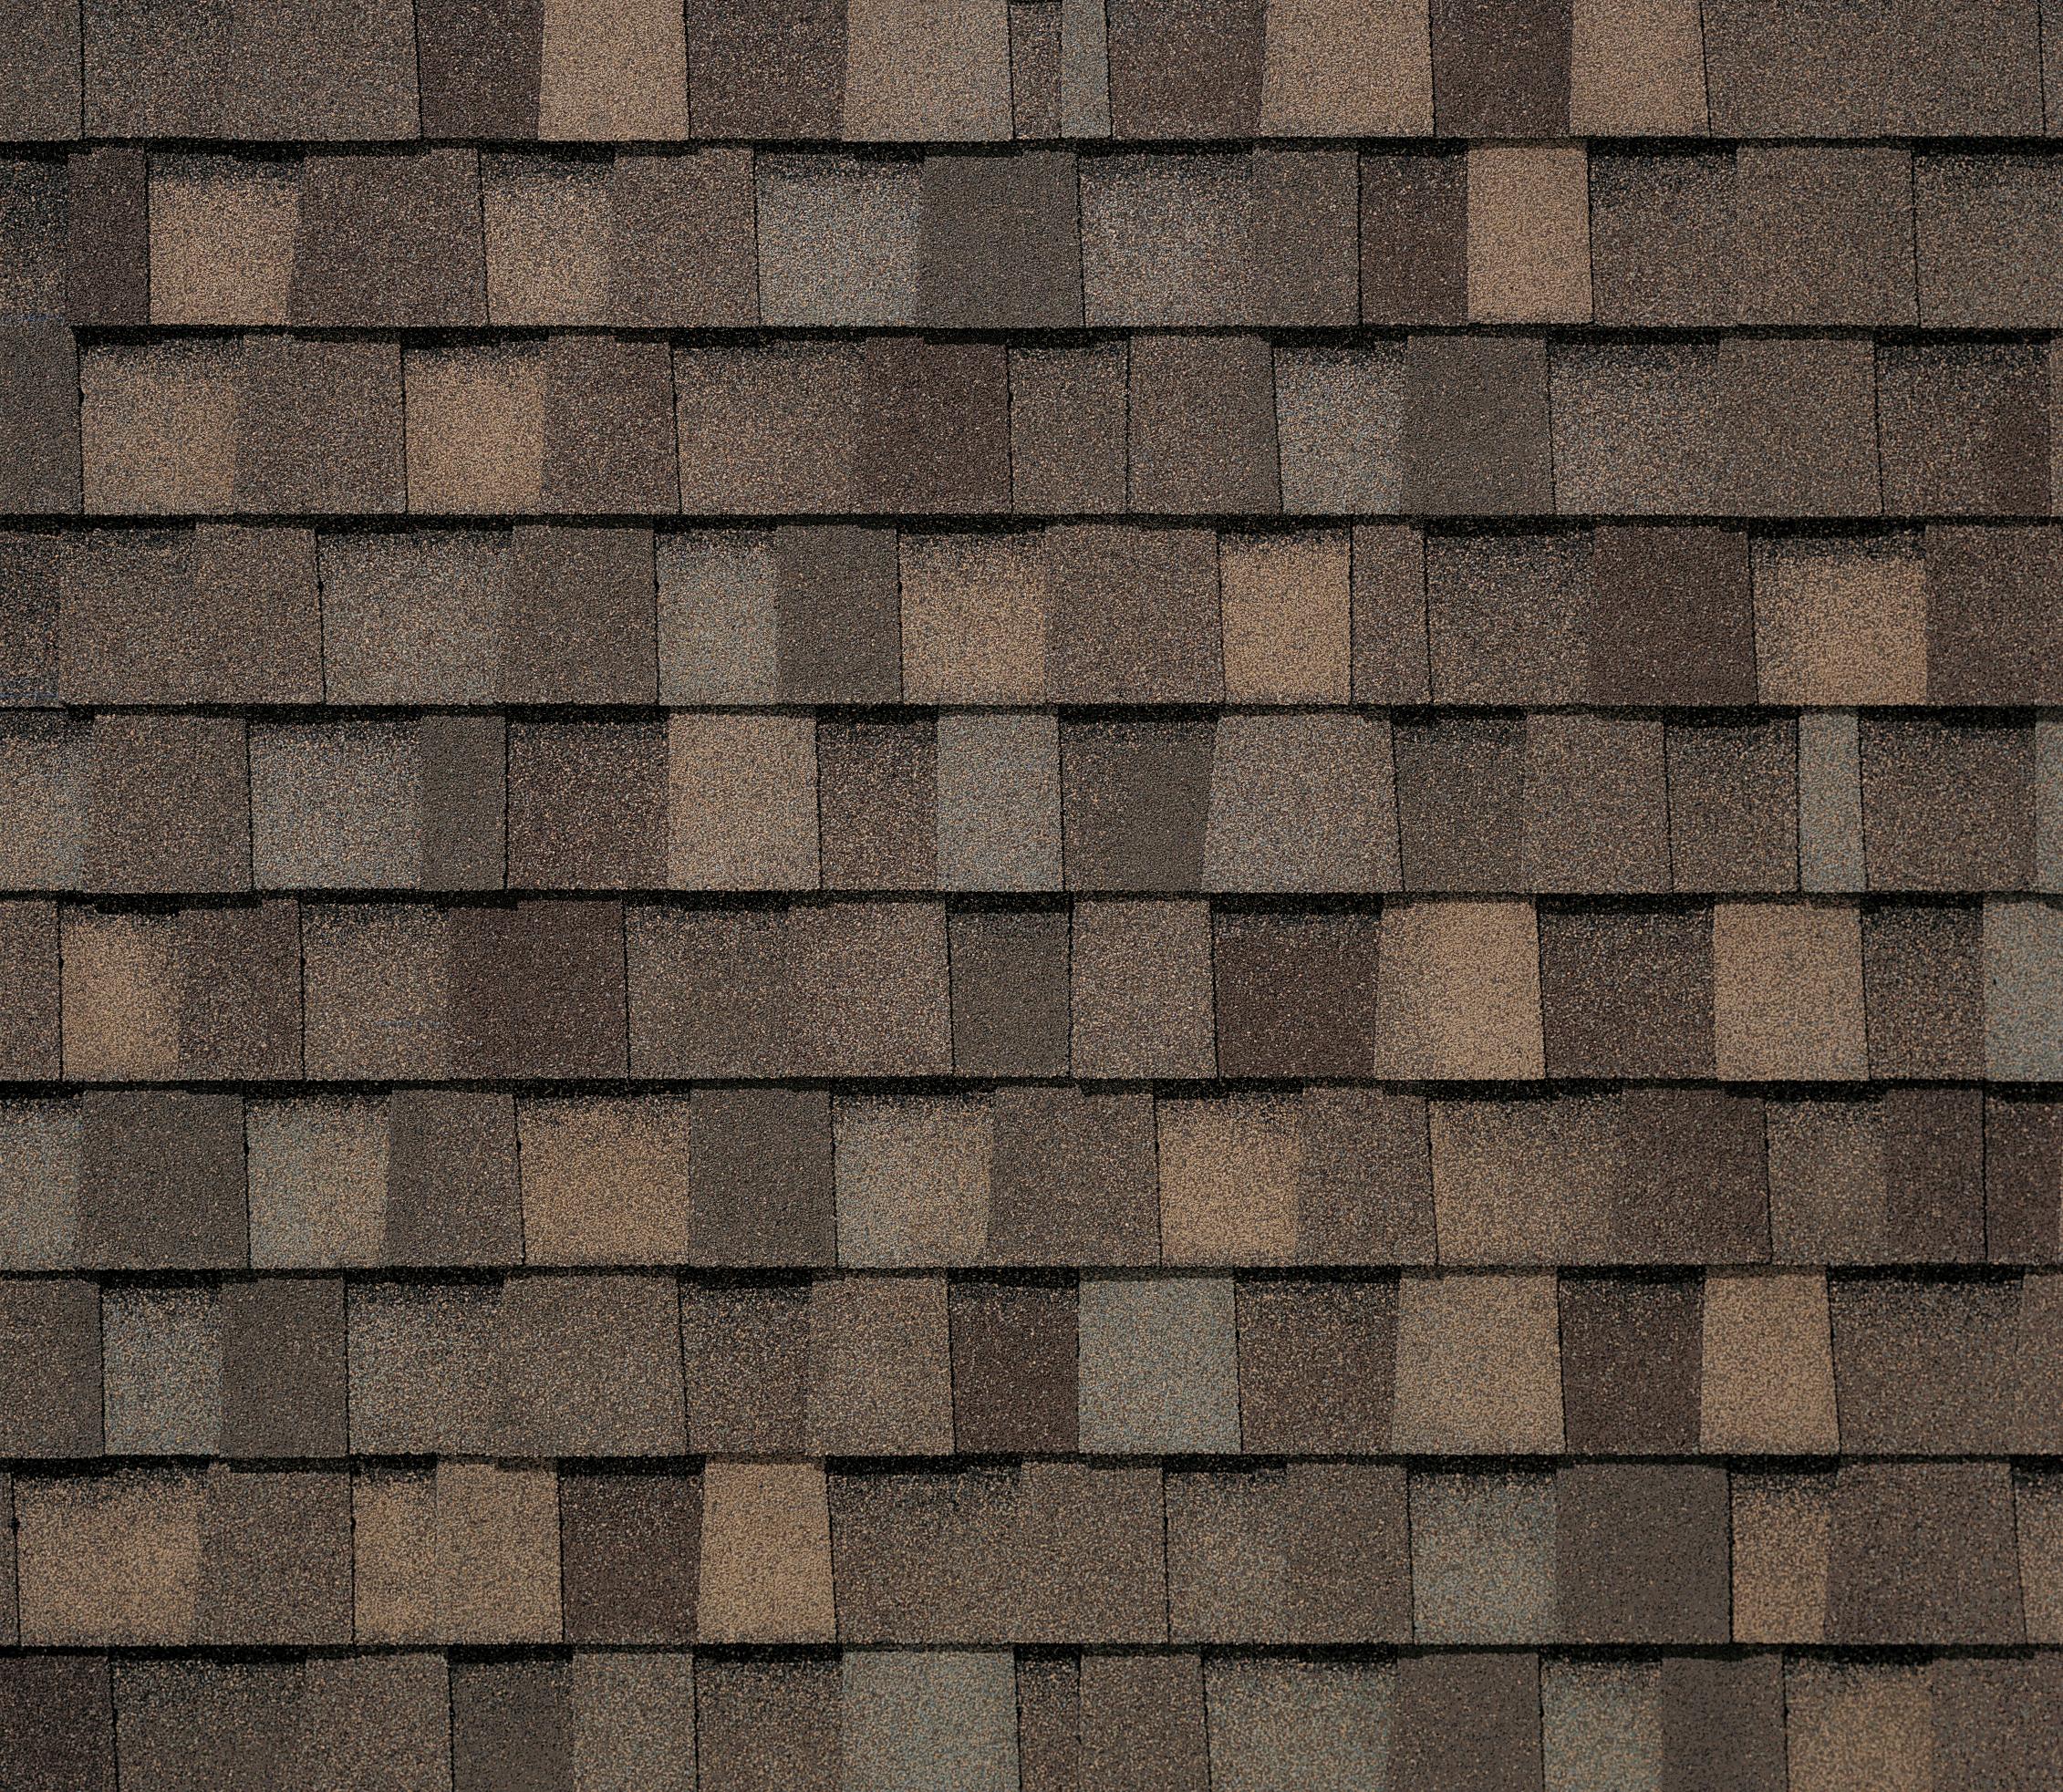 Kearney roofing builders for Tamko shingles